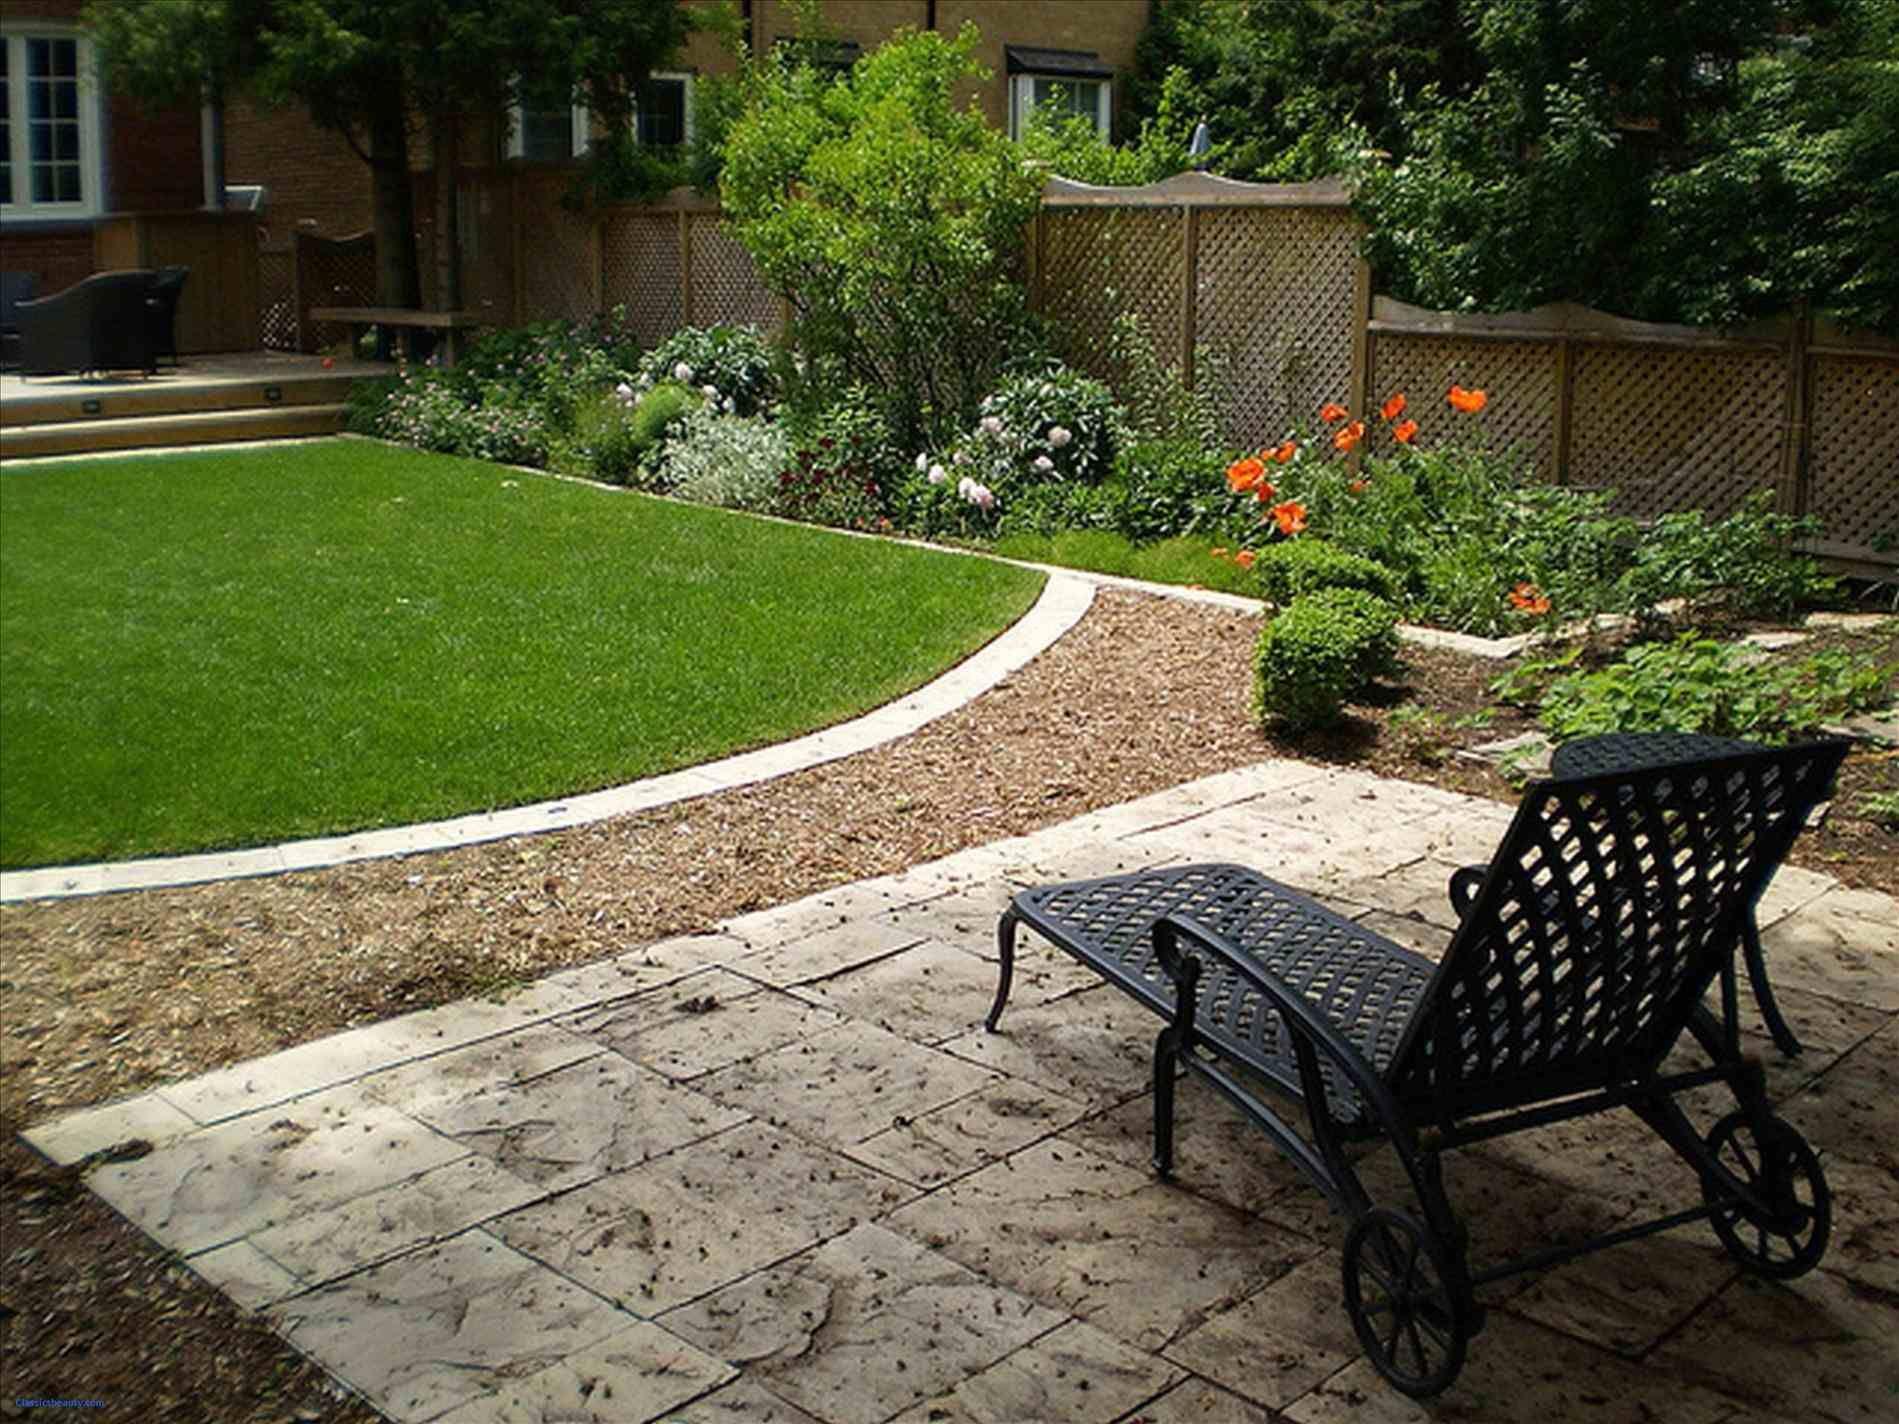 30 Clever Diy Ideas How To Landscape Backyard Garden Simphome